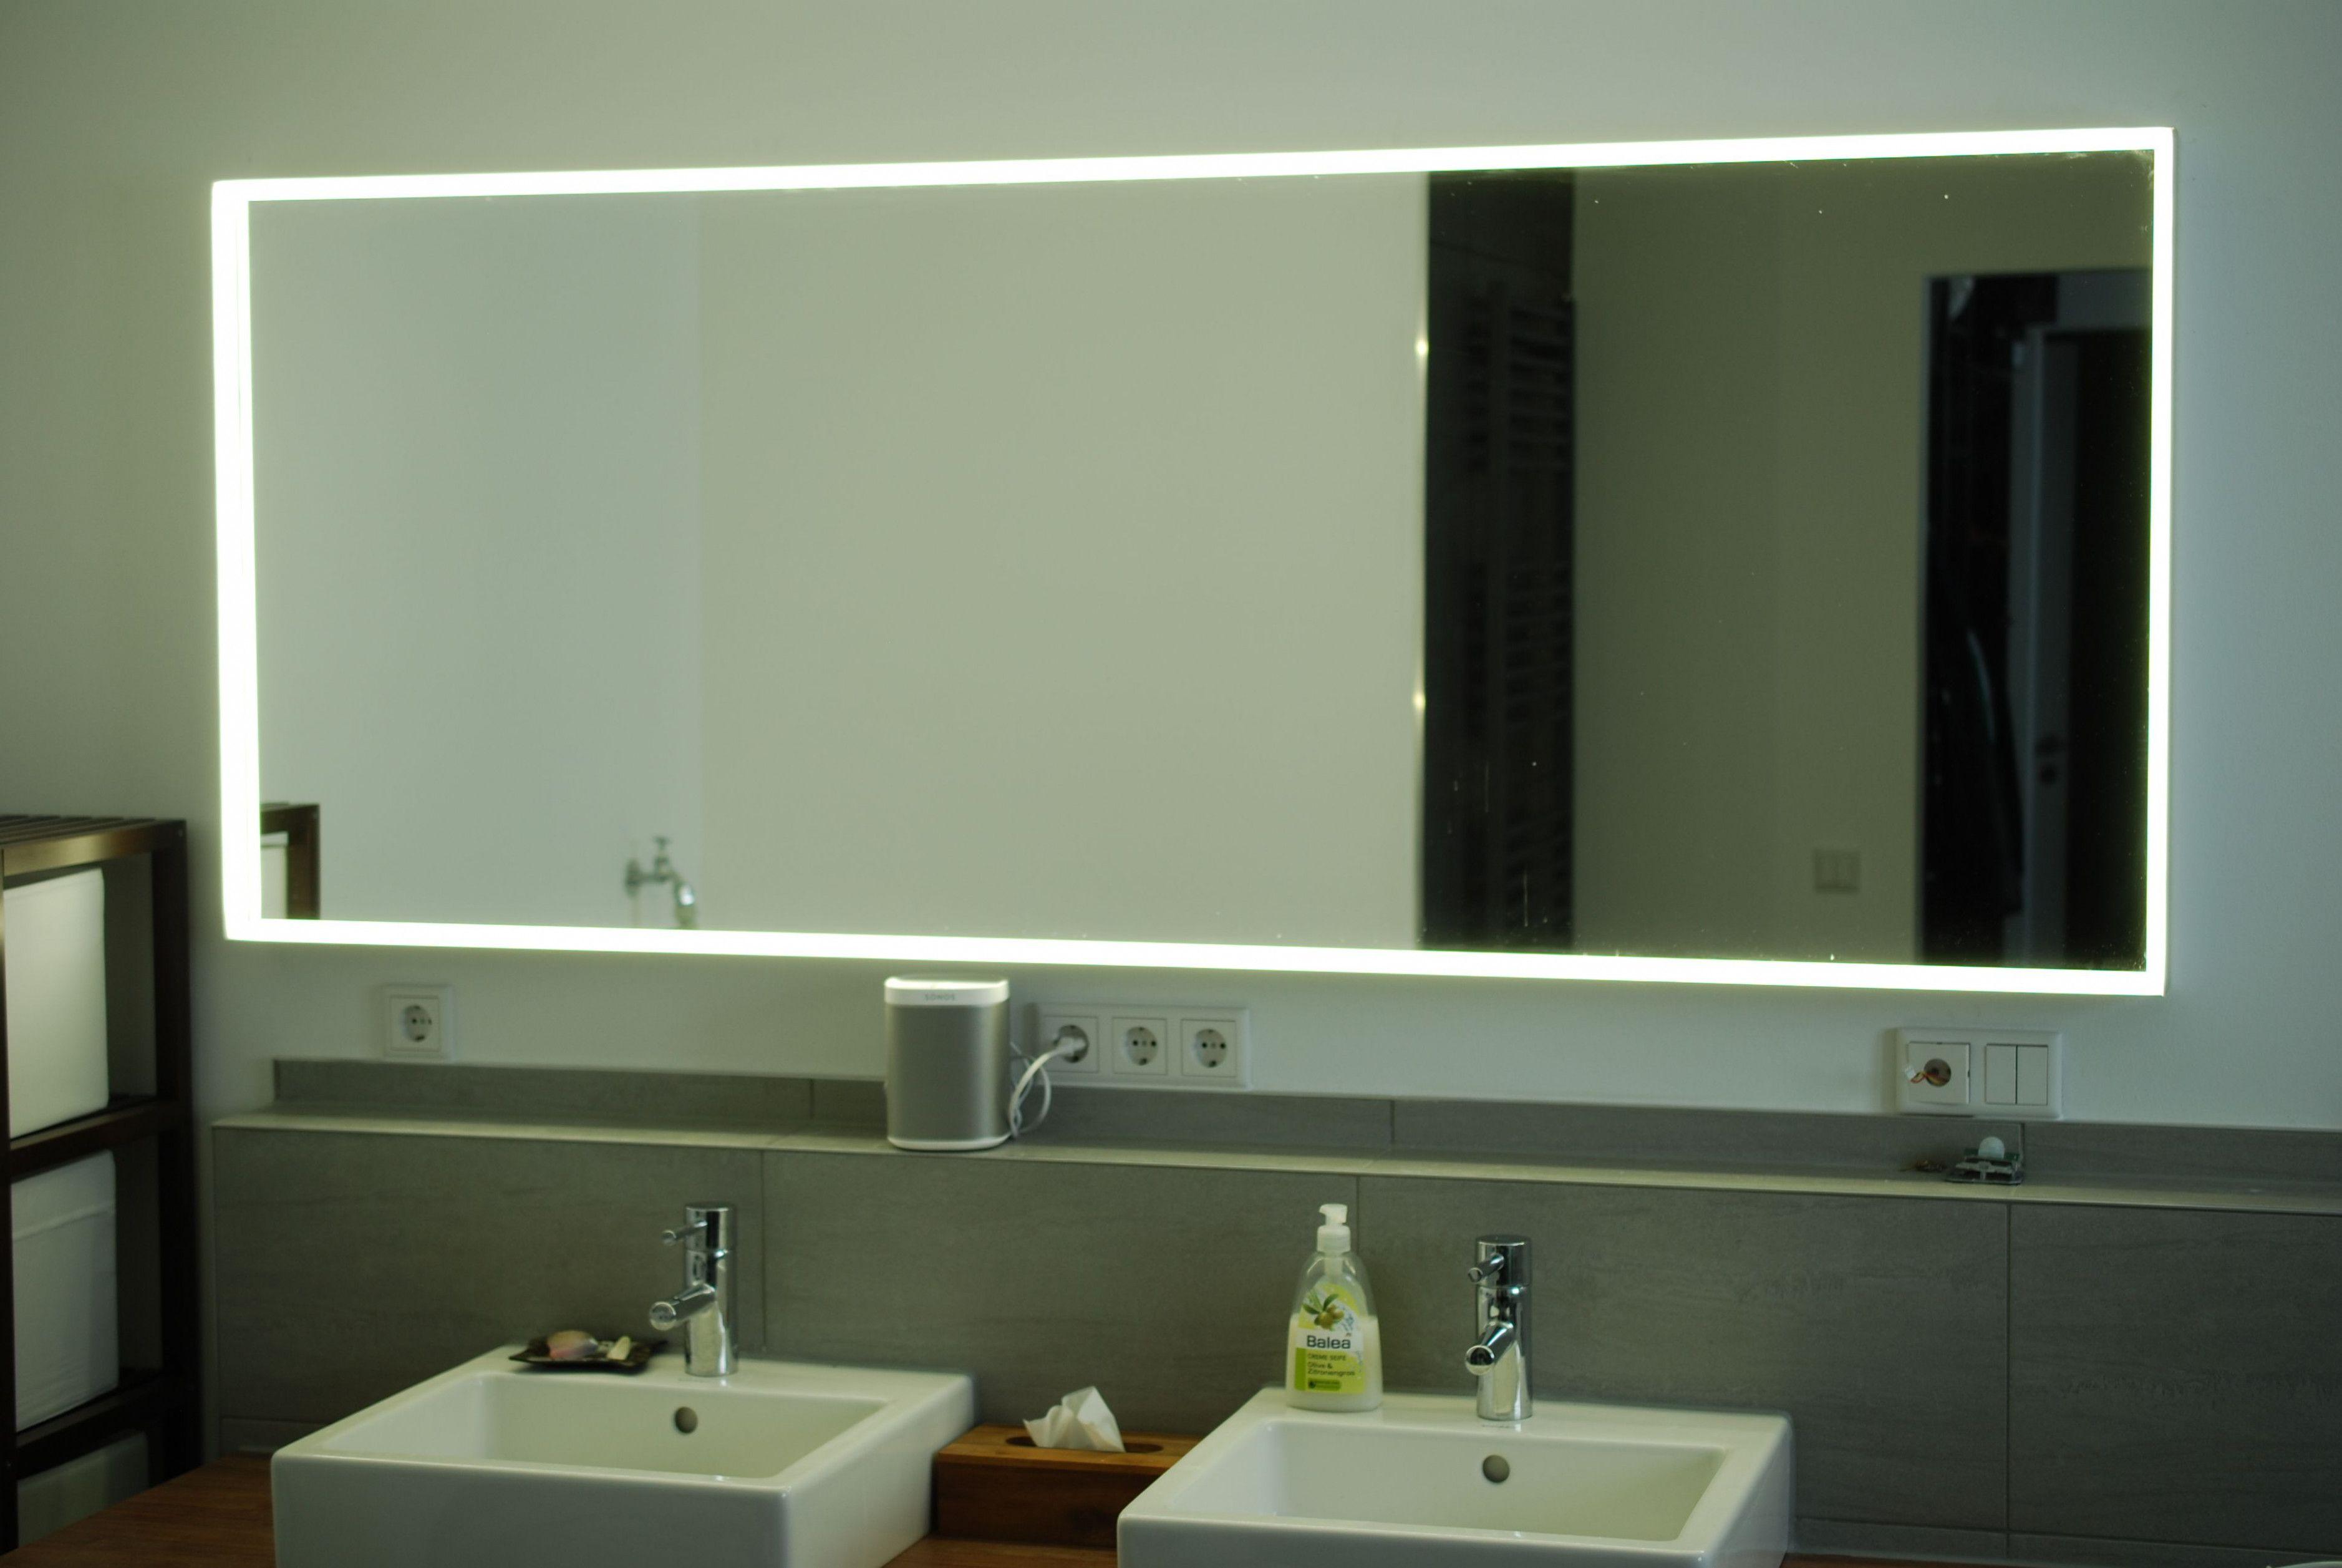 Ikea Hack Ikea Spiegel Mit Eigener Led Stripe Installation Beleuchteter Badezimmer Spiegel Check More At Htt Led Spiegel Badezimmer Design Badgestaltung